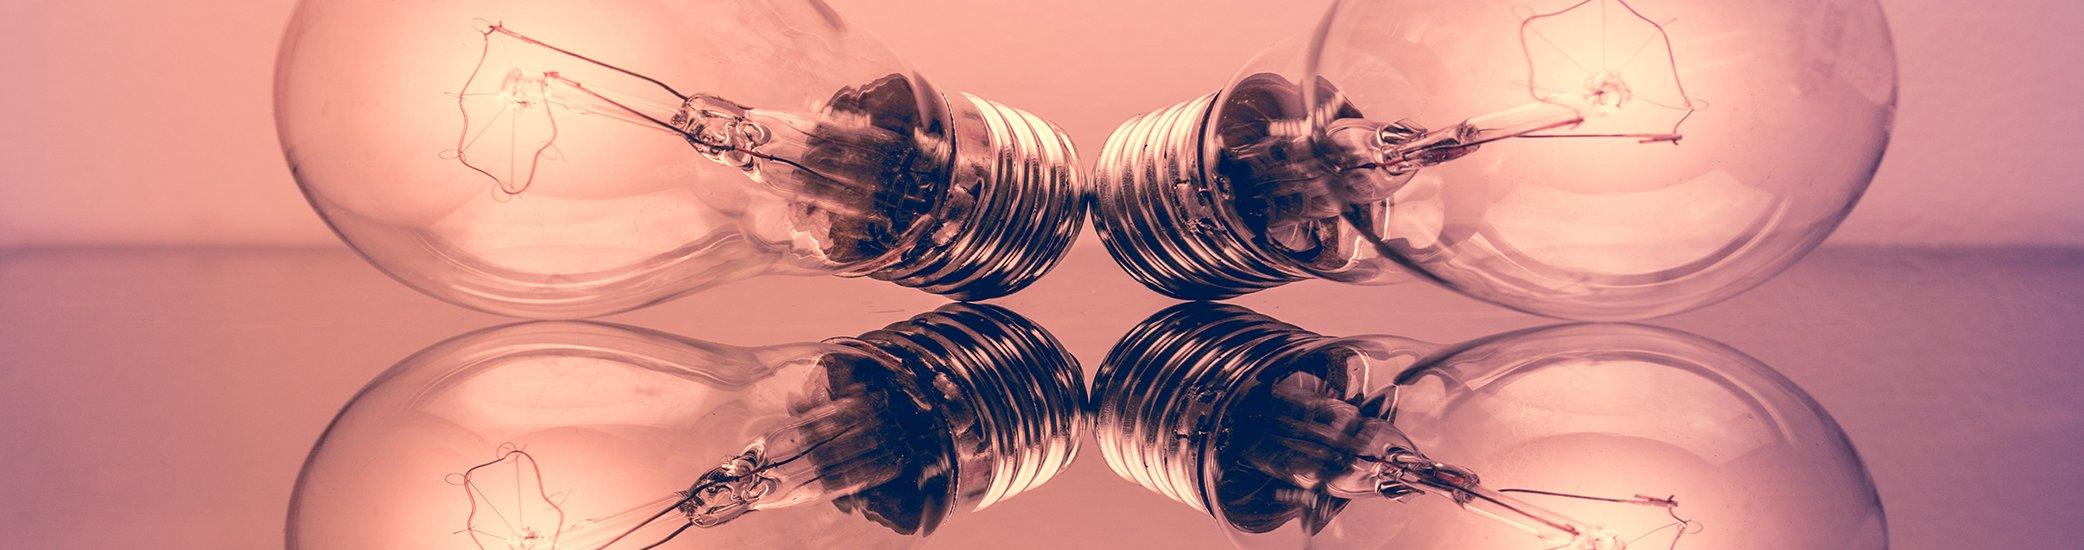 Innovation - Photo by Dragos Gontariu on Unsplash